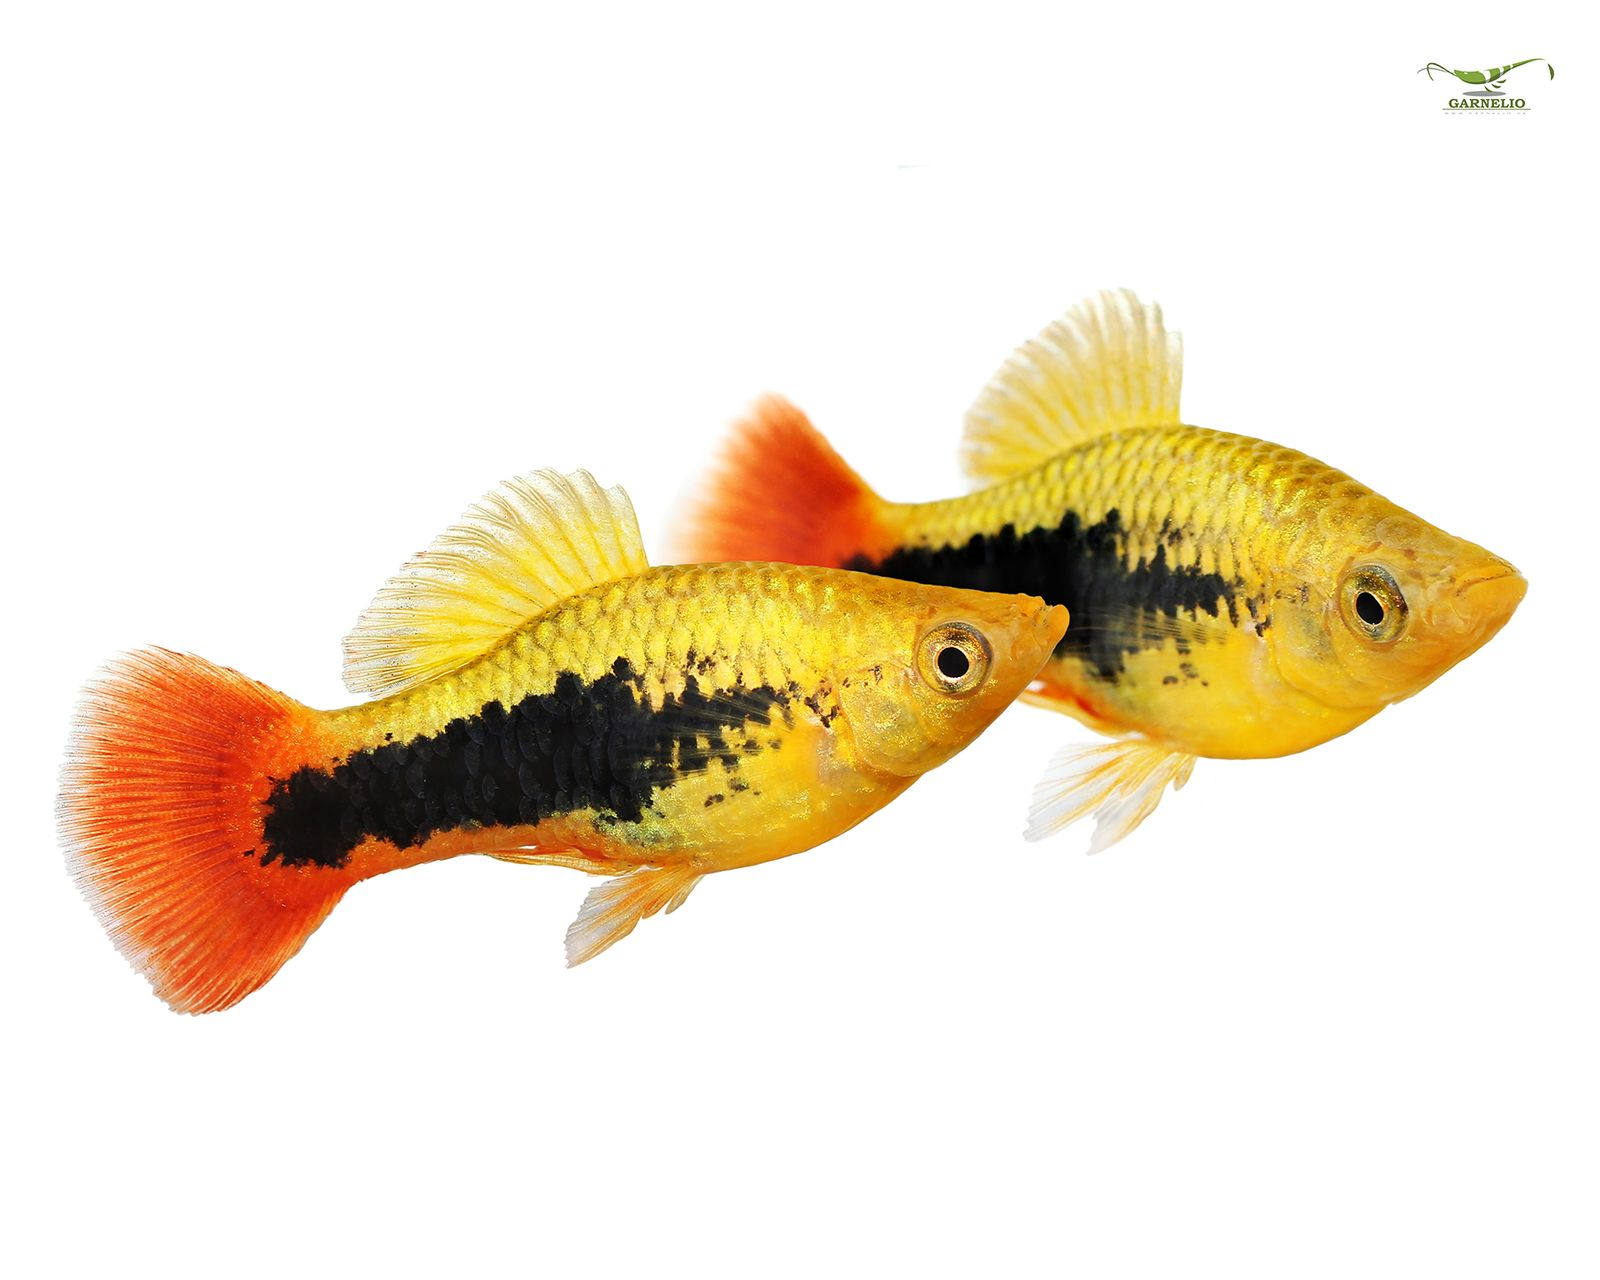 Für aquarium anfängerfische 60l Futterautomat Aquarium